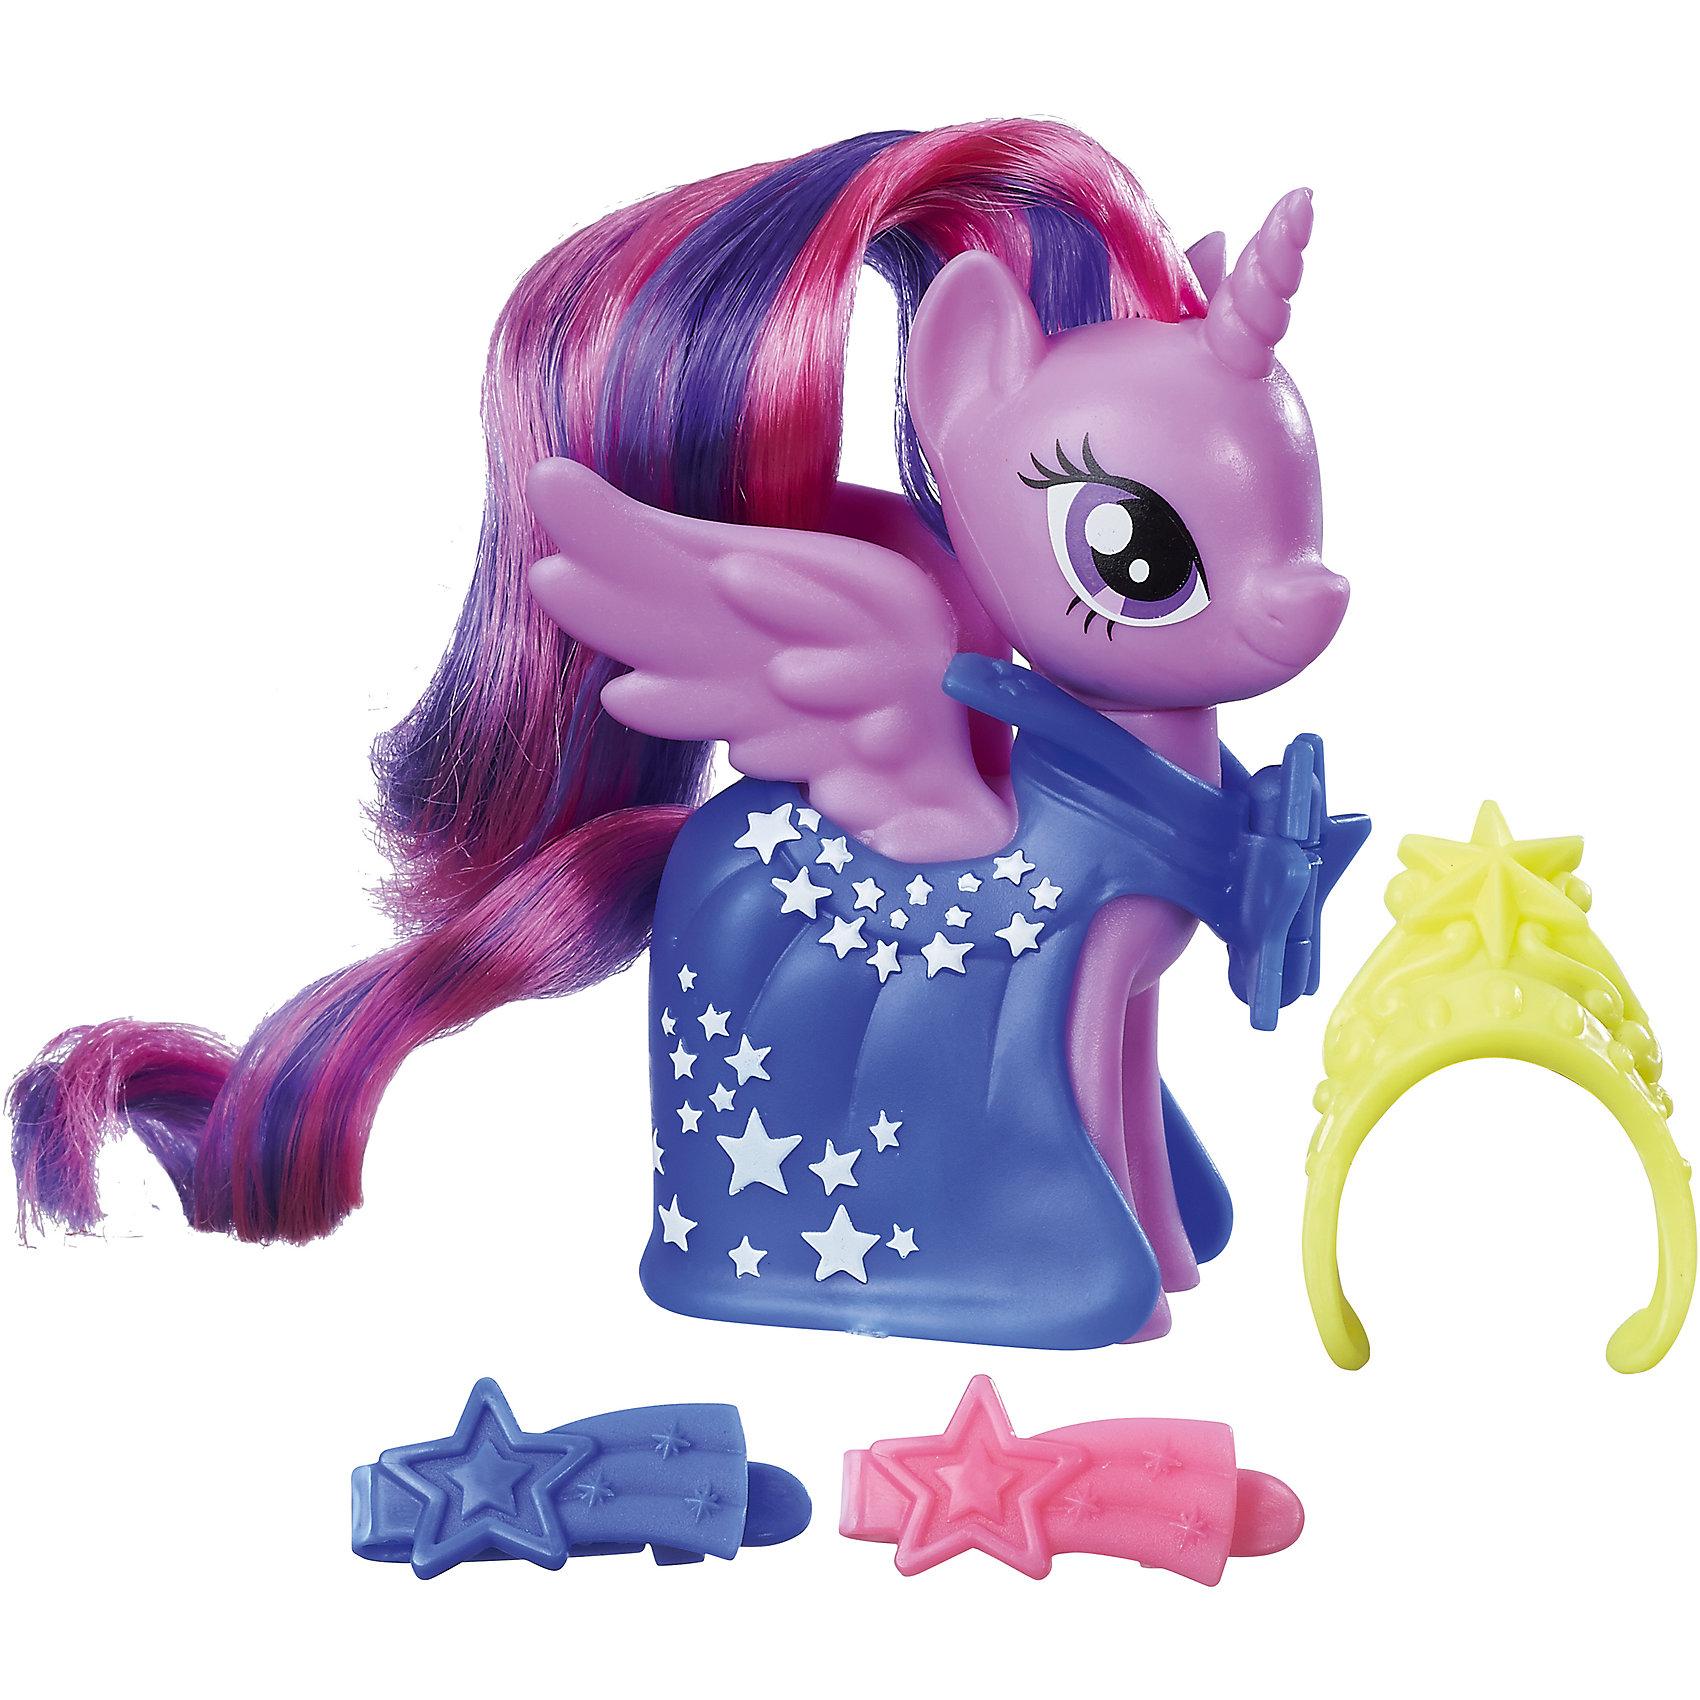 Пони-модницы, My little Pony, Hasbro, B8810/B9623Любимые герои<br><br><br>Ширина мм: 48<br>Глубина мм: 178<br>Высота мм: 184<br>Вес г: 145<br>Возраст от месяцев: 36<br>Возраст до месяцев: 2147483647<br>Пол: Женский<br>Возраст: Детский<br>SKU: 6674412